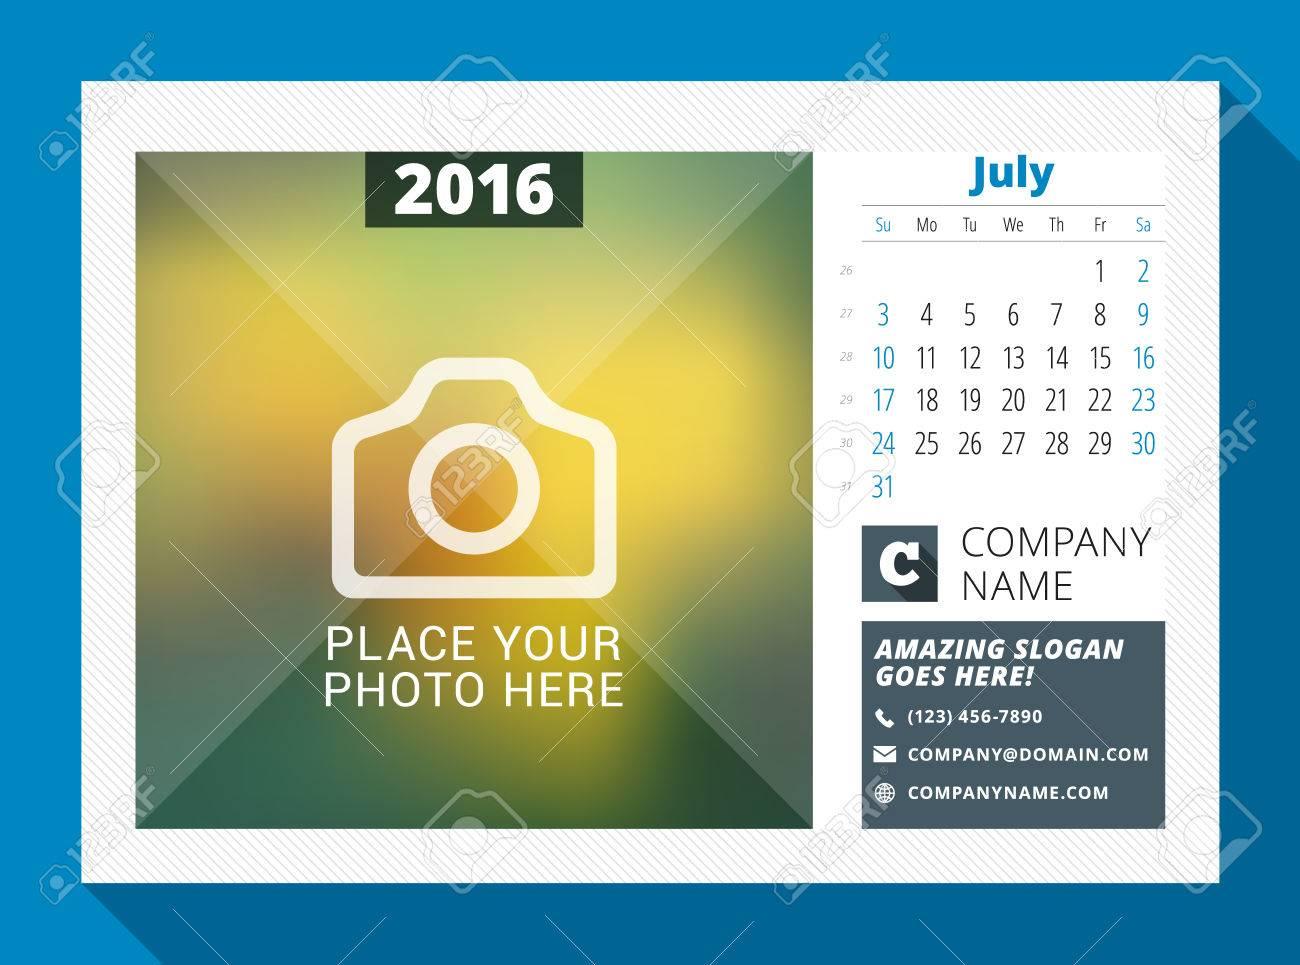 Juillet 2016 Desk Calendar Pour 2016 Annee Vector Design Modele D